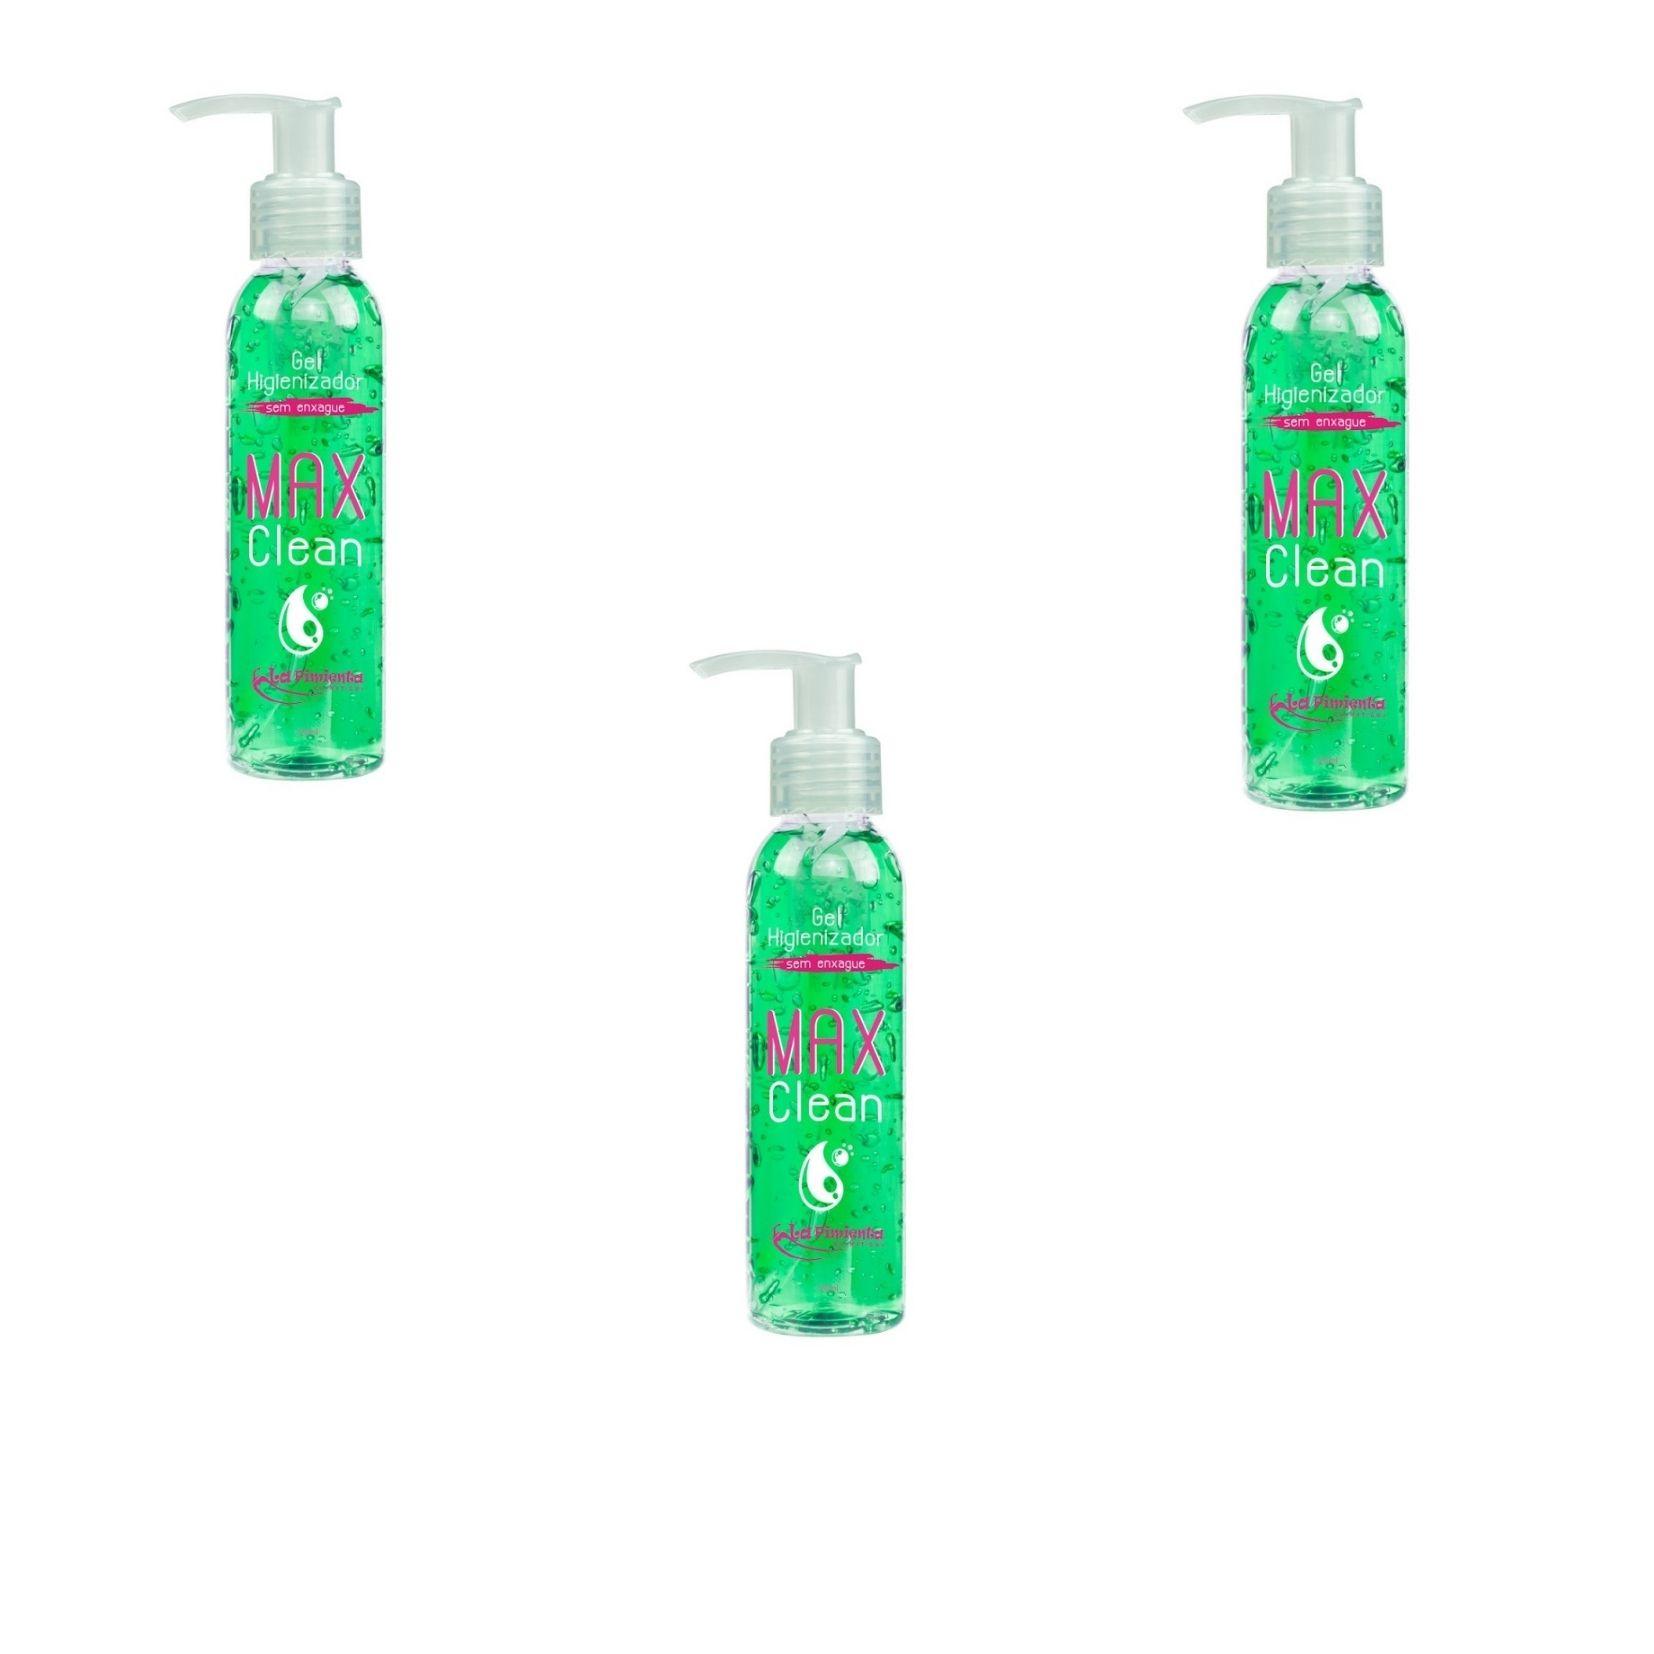 Gel Higienizador Max Clean 120ml